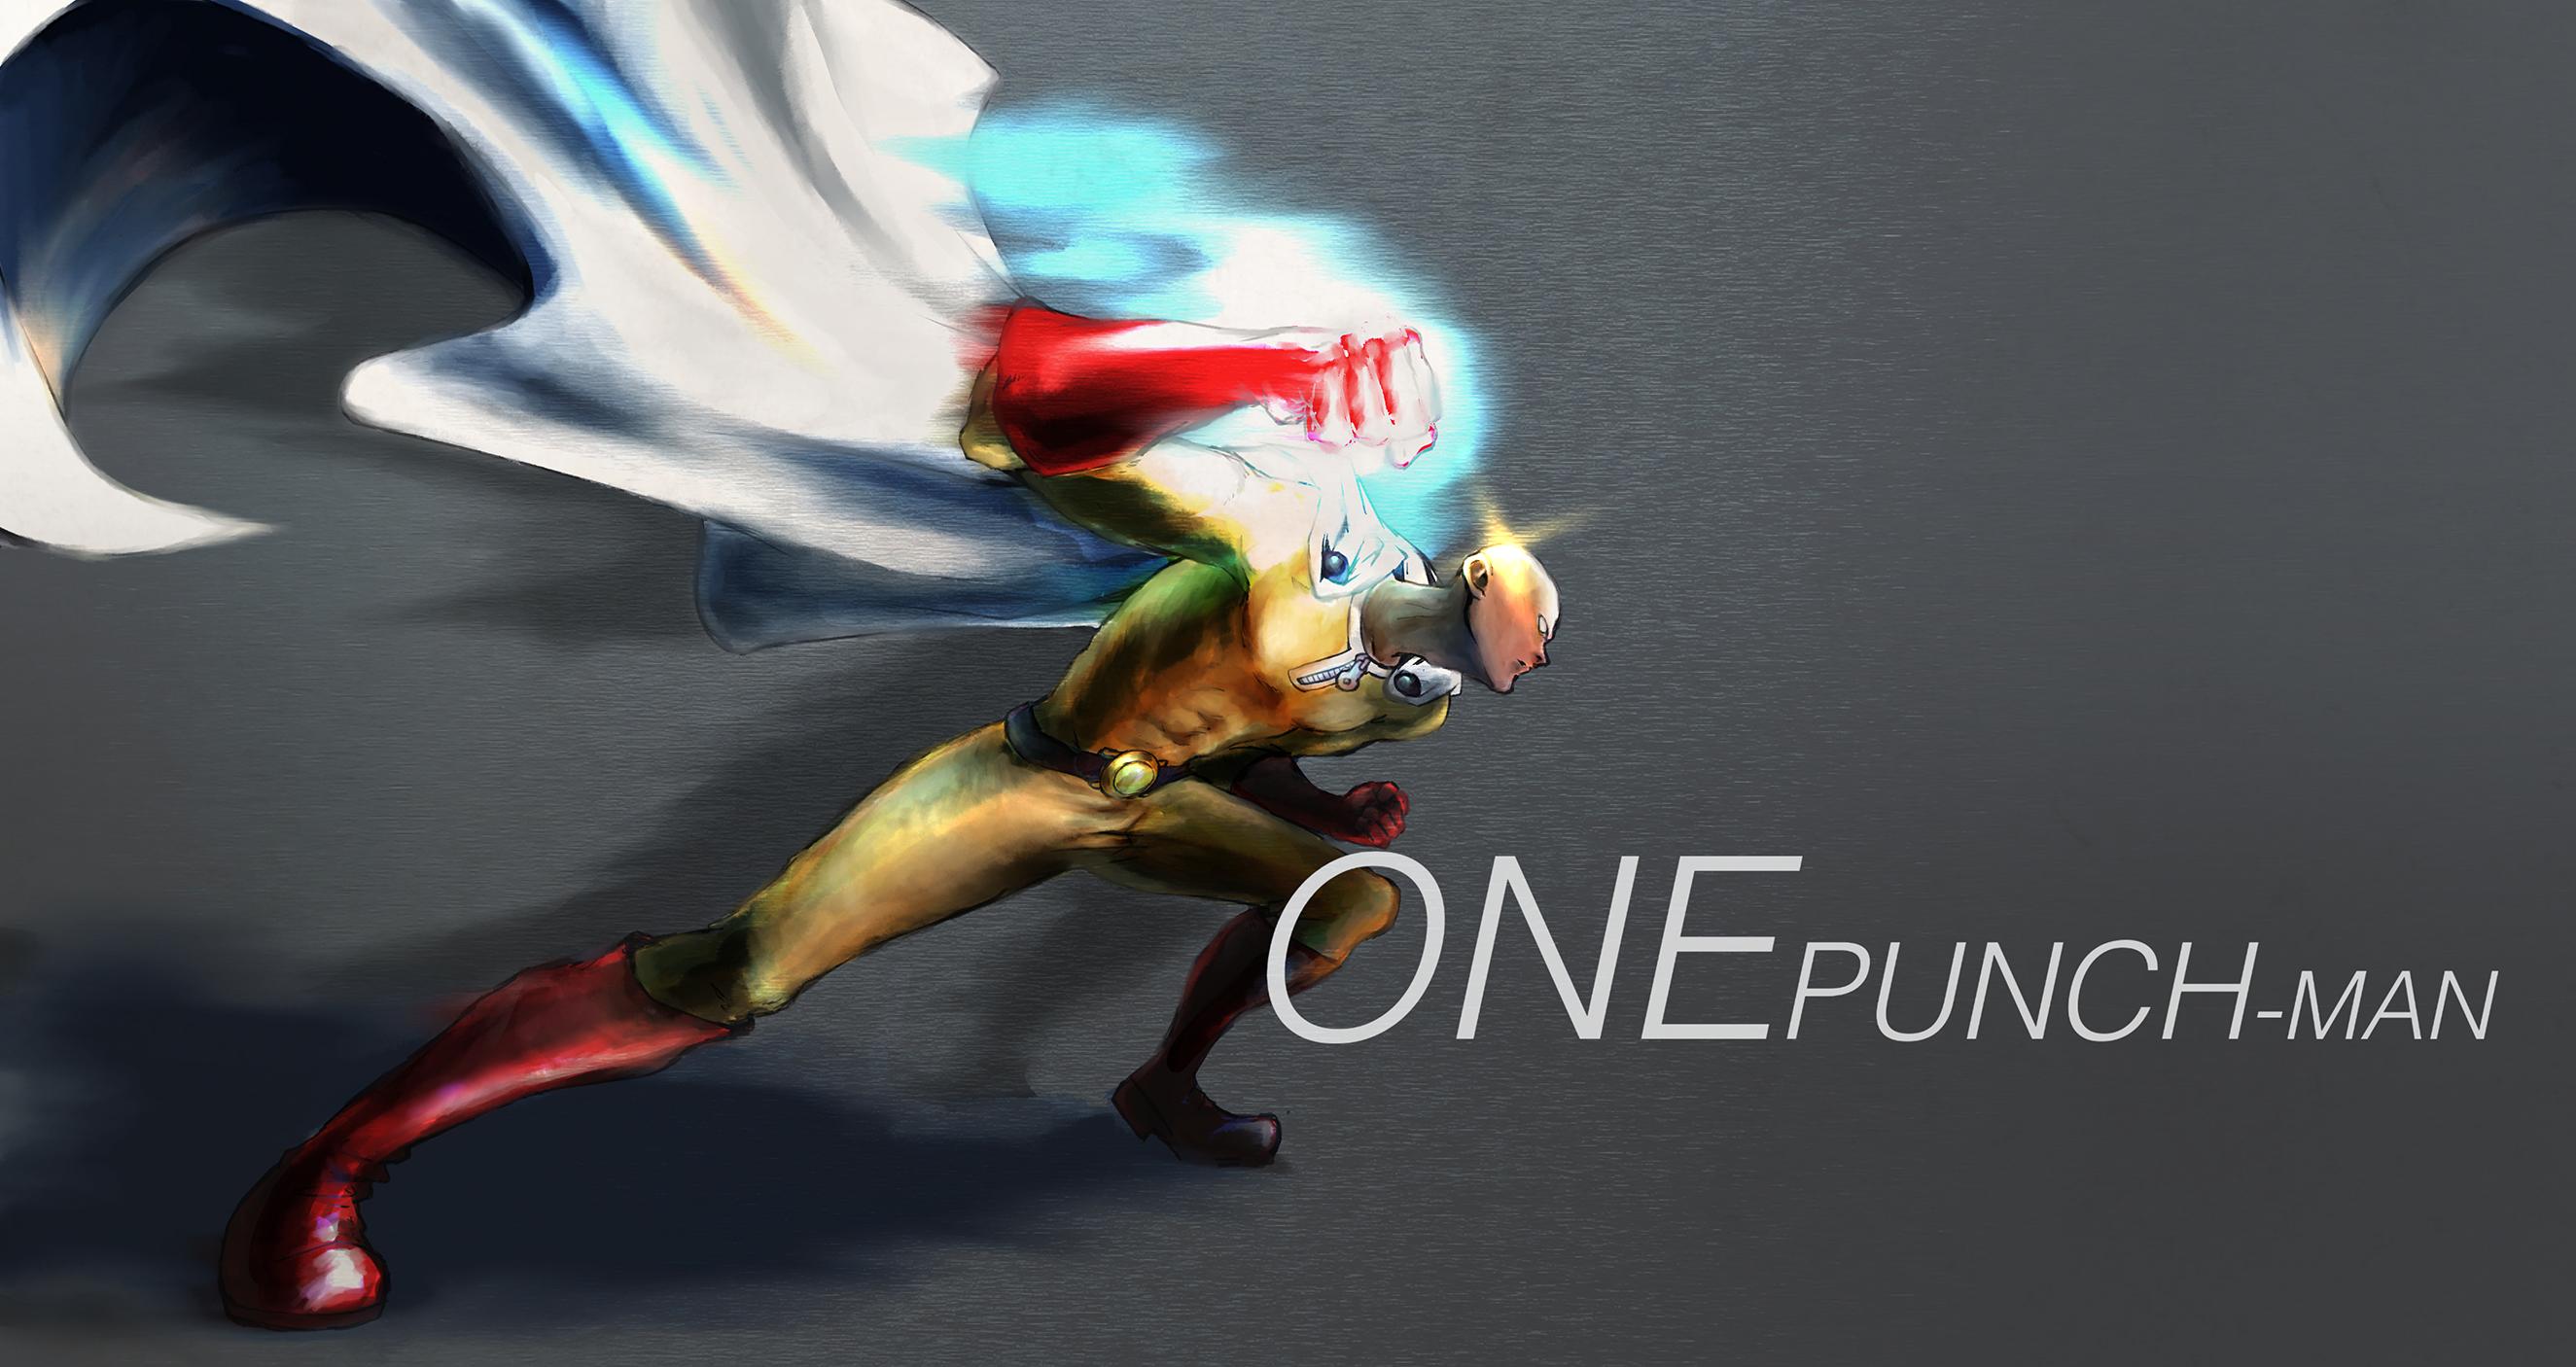 One Punch Man Ultimate Fanart Compilation Album 2 - Album on Imgur